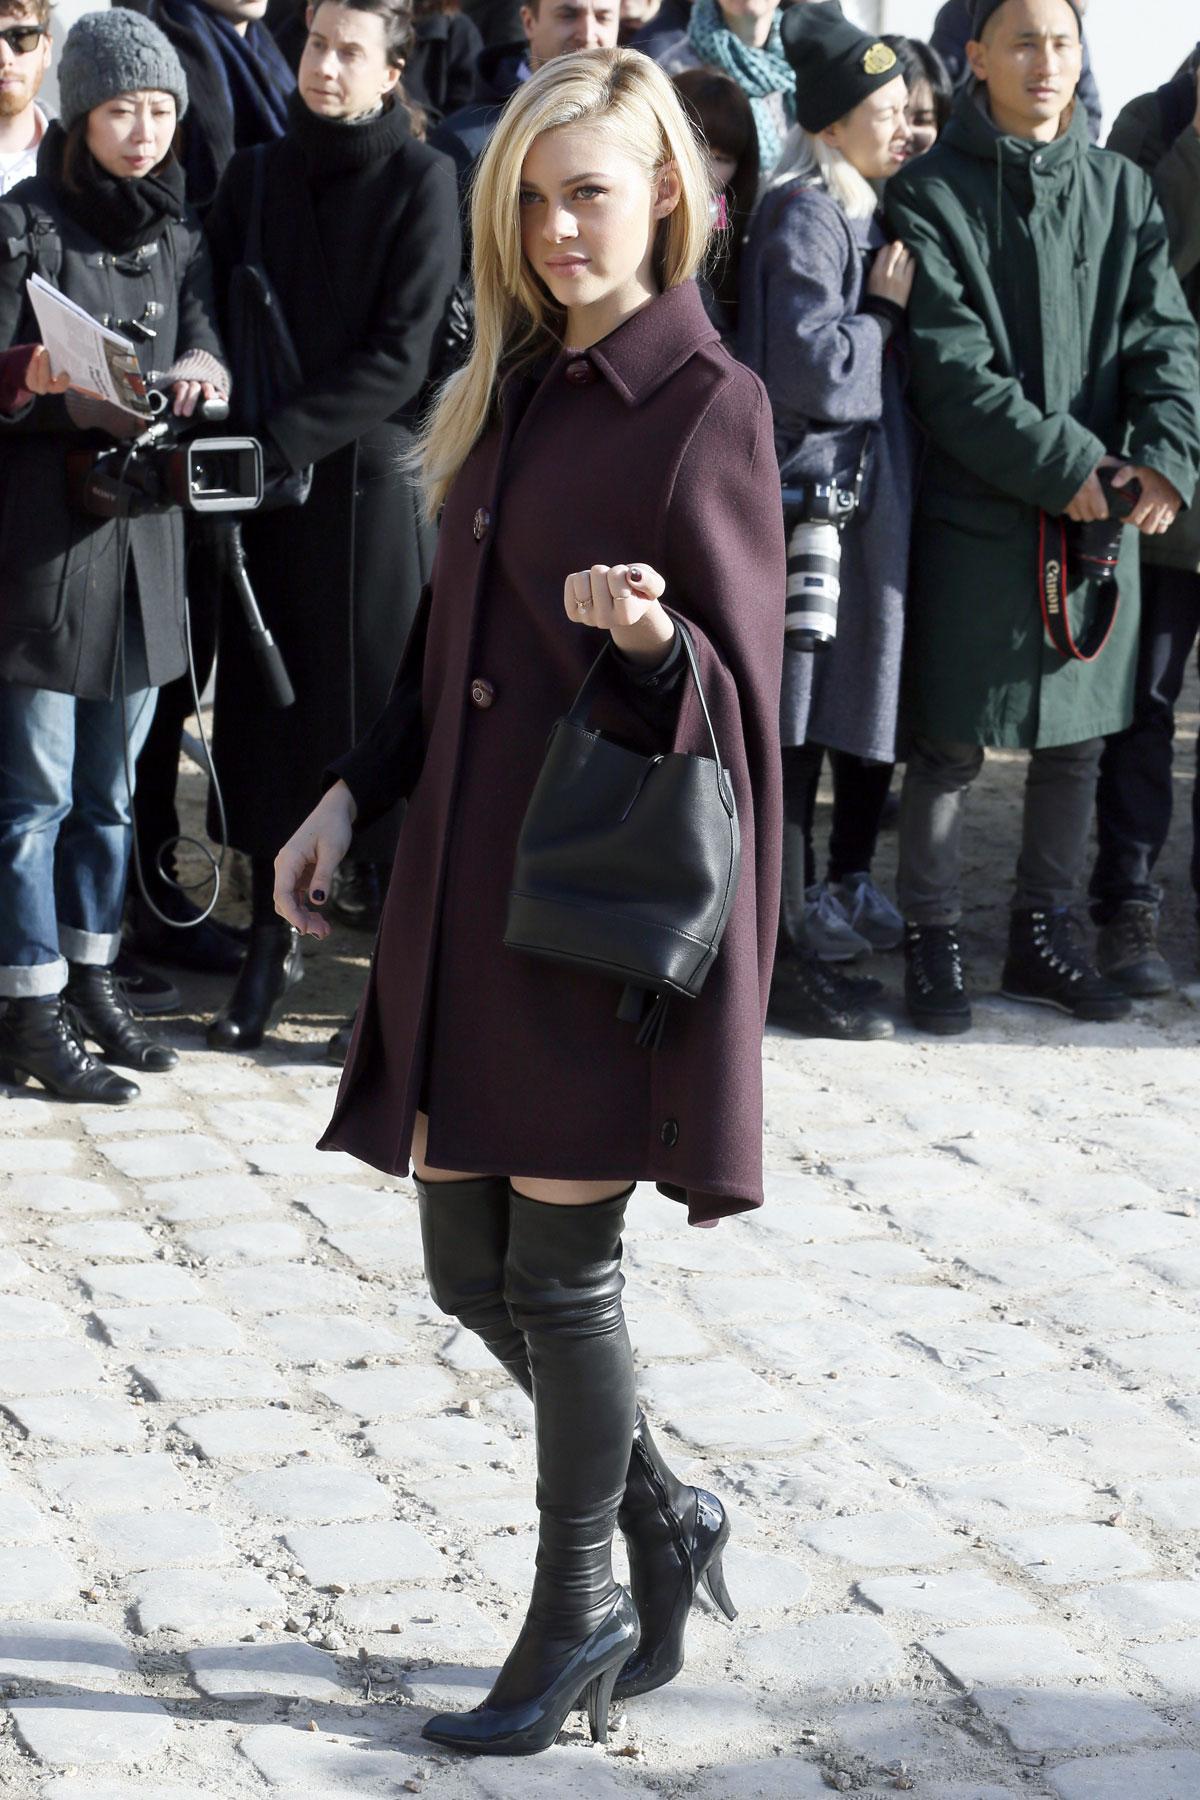 Nicola Peltz attends the Louis Vuitton show